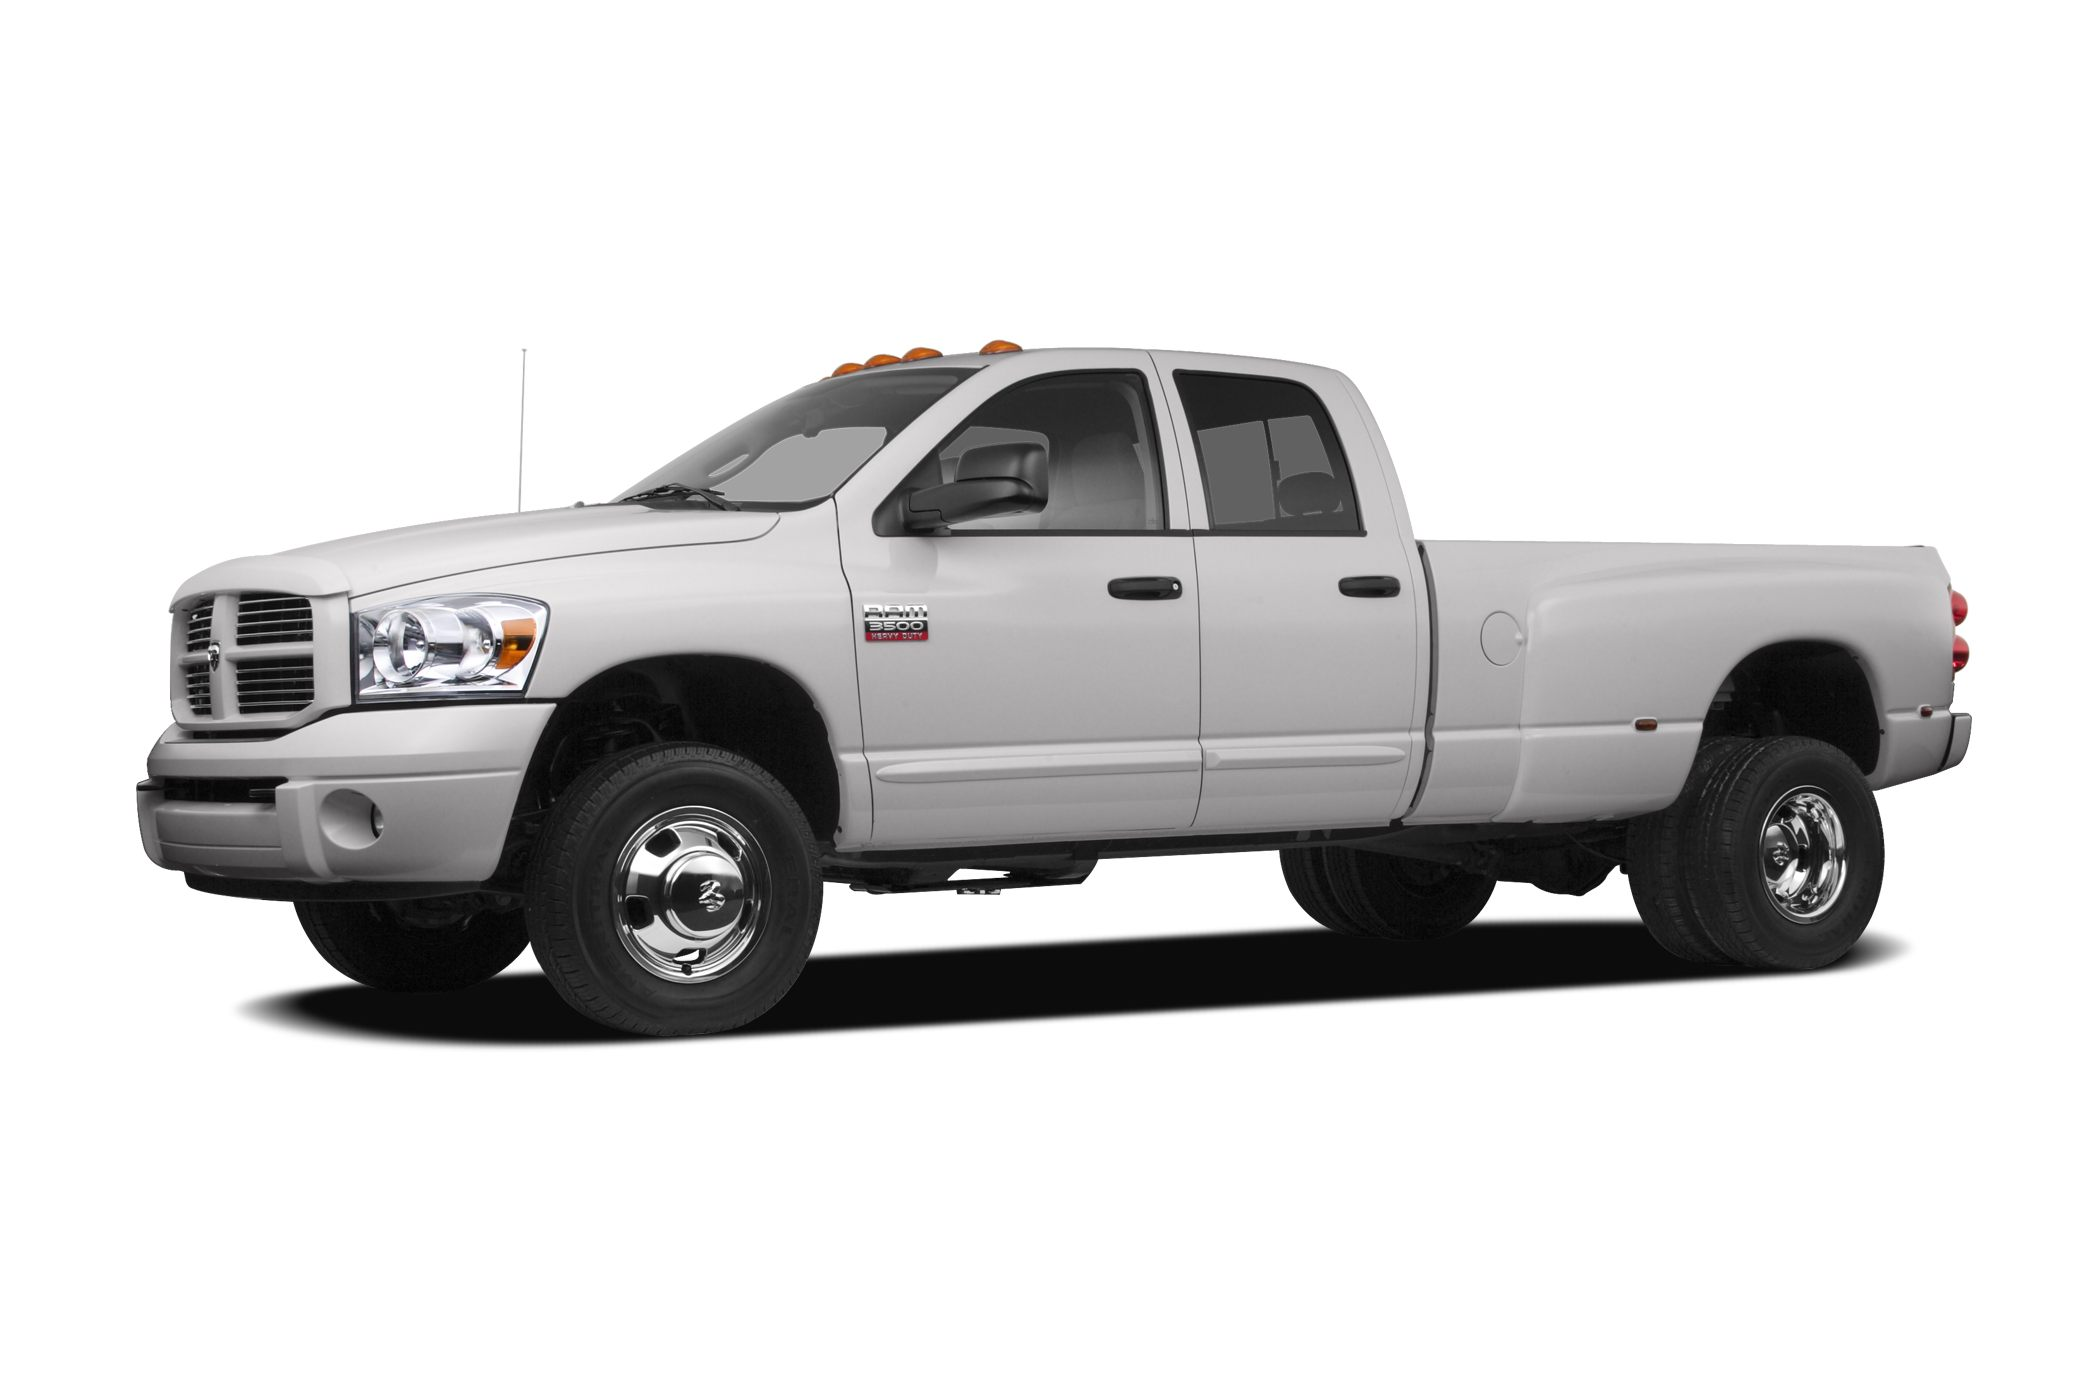 2007 Dodge Ram 3500  Miles 136947Color Red Stock 16070 VIN 3D7MX48A07G846707